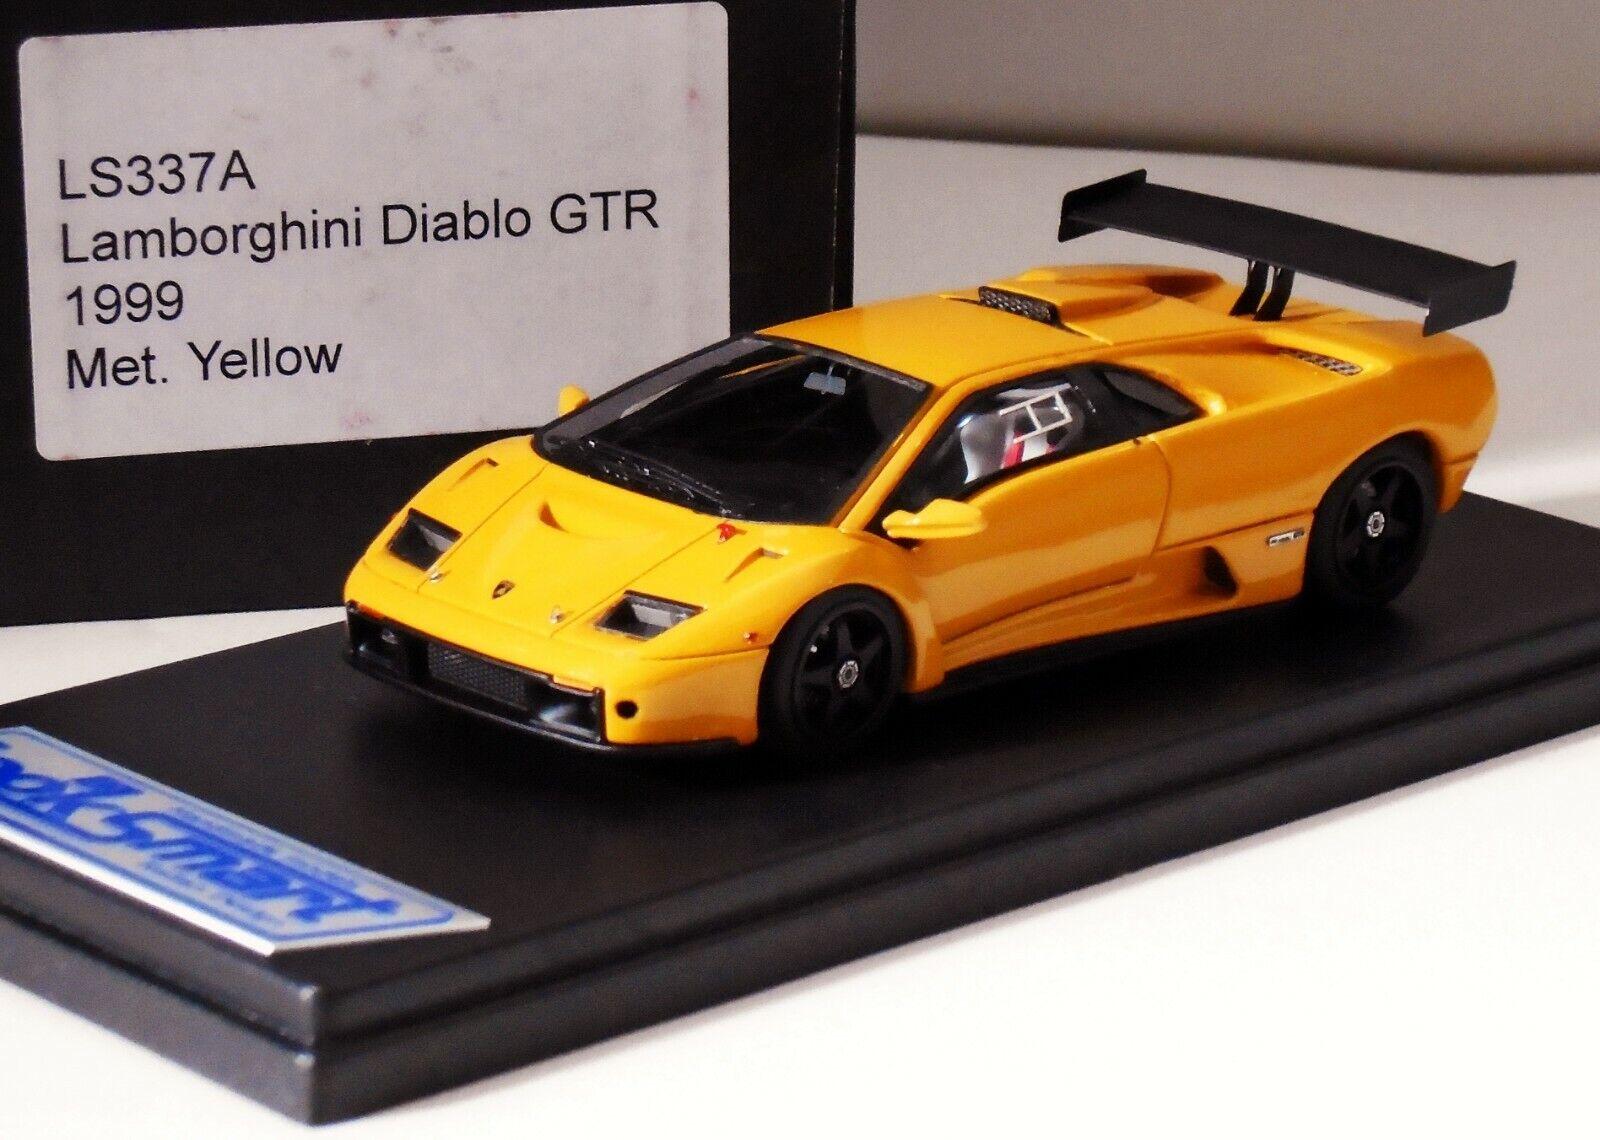 Lamborghini Diablo GTR 1999 Métallique Jaune Looksmart LS337A 1 43